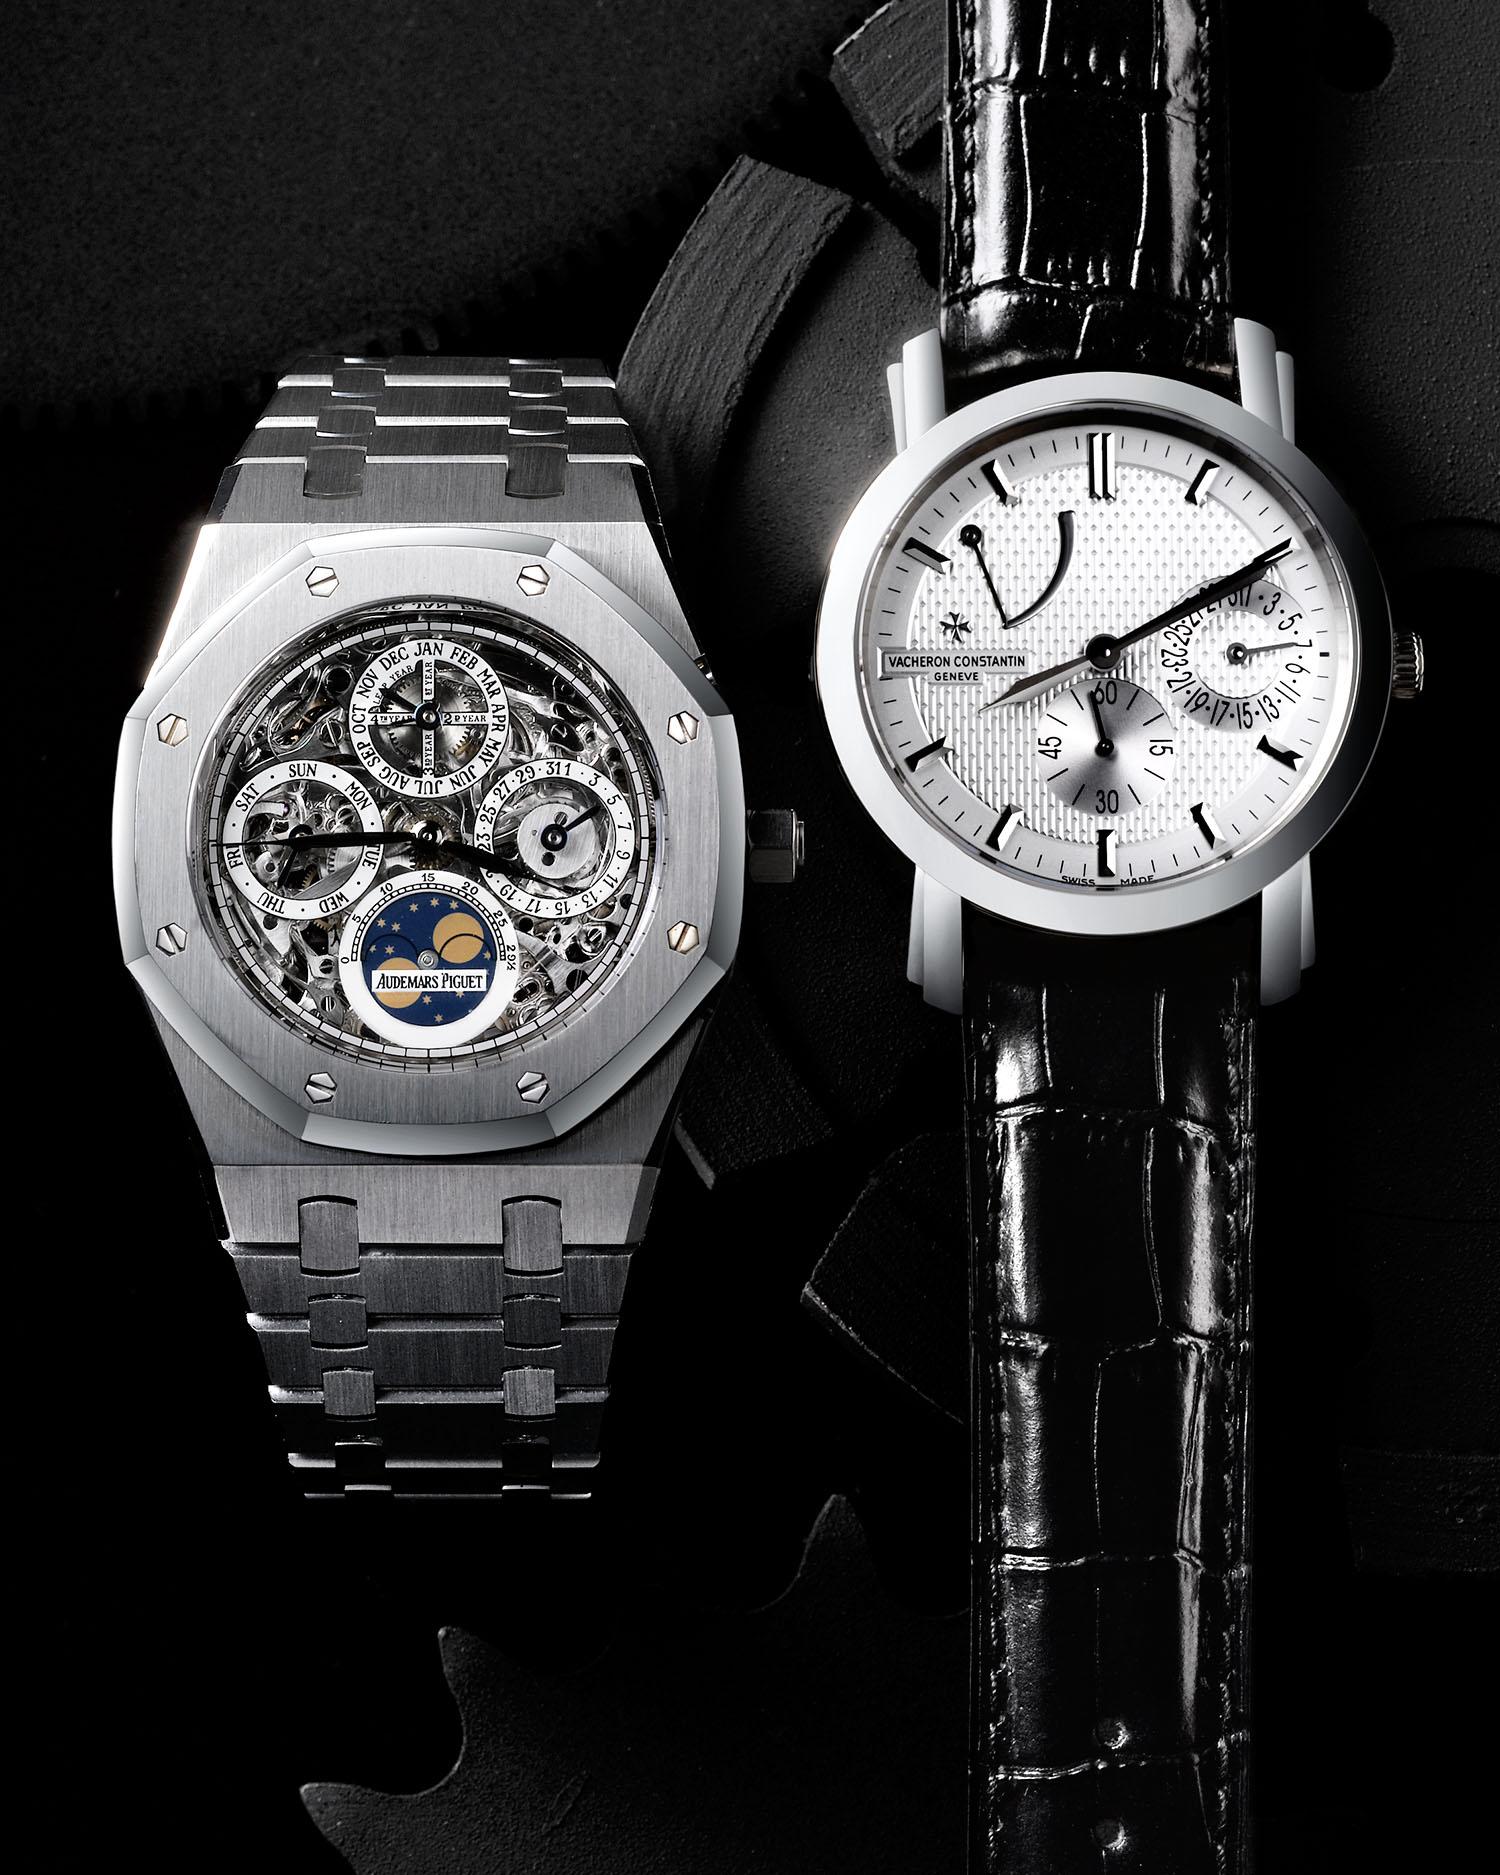 3793_ENTREE_2 Watches_V2.jpg